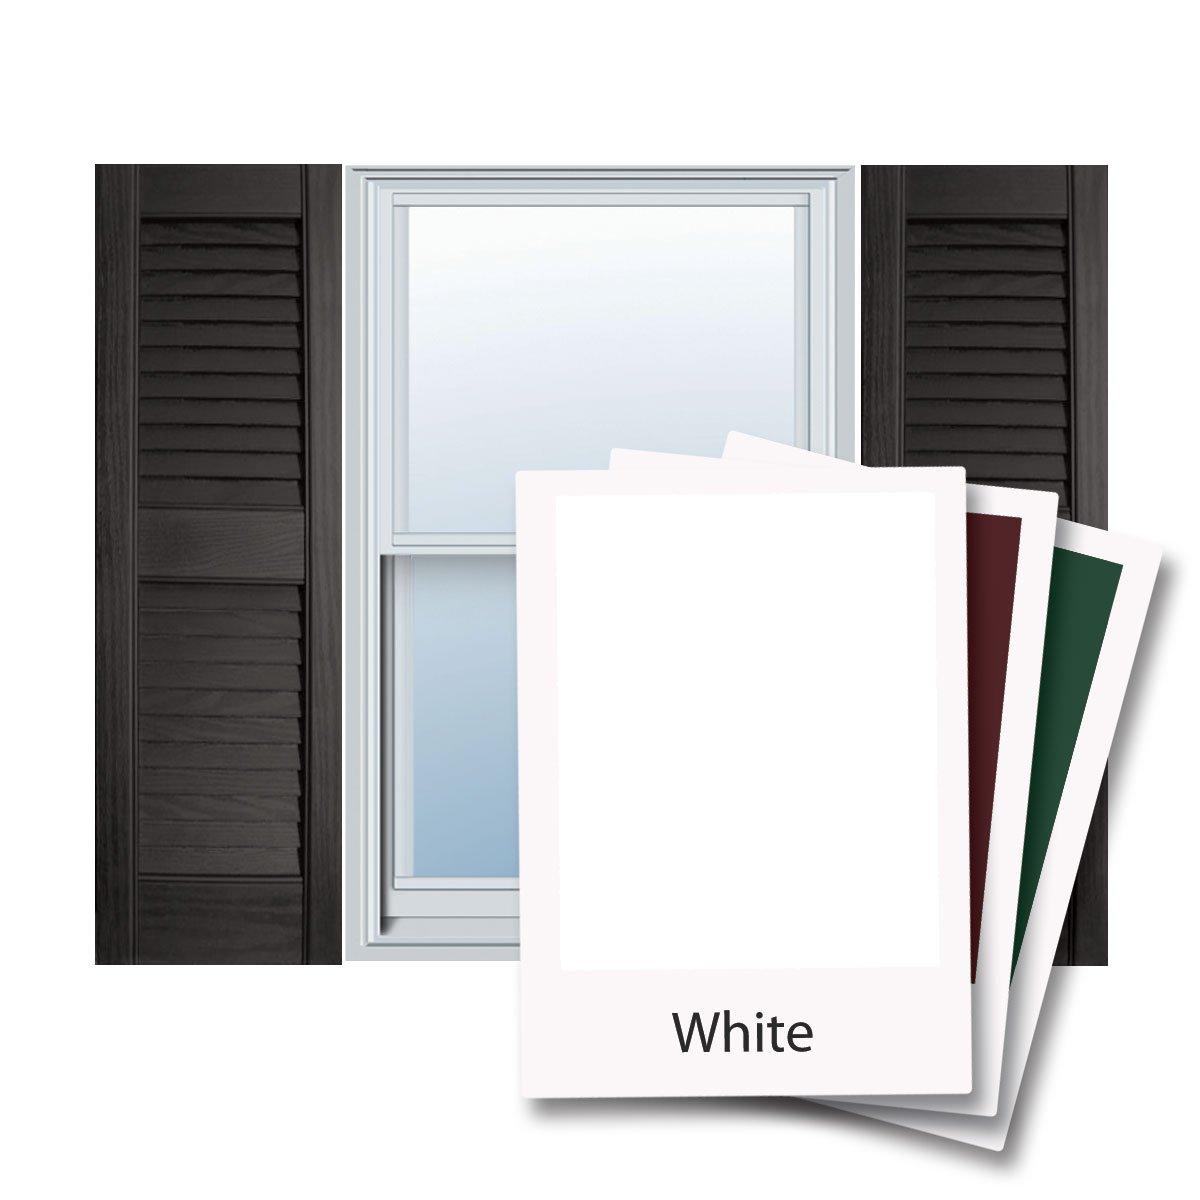 12'' x 28'' Builders Choice Vinyl Open Louver Window Shutters, w/Shutter Spikes & Screws (Per Pair), White by ArchitecturalDepot.com (Image #1)